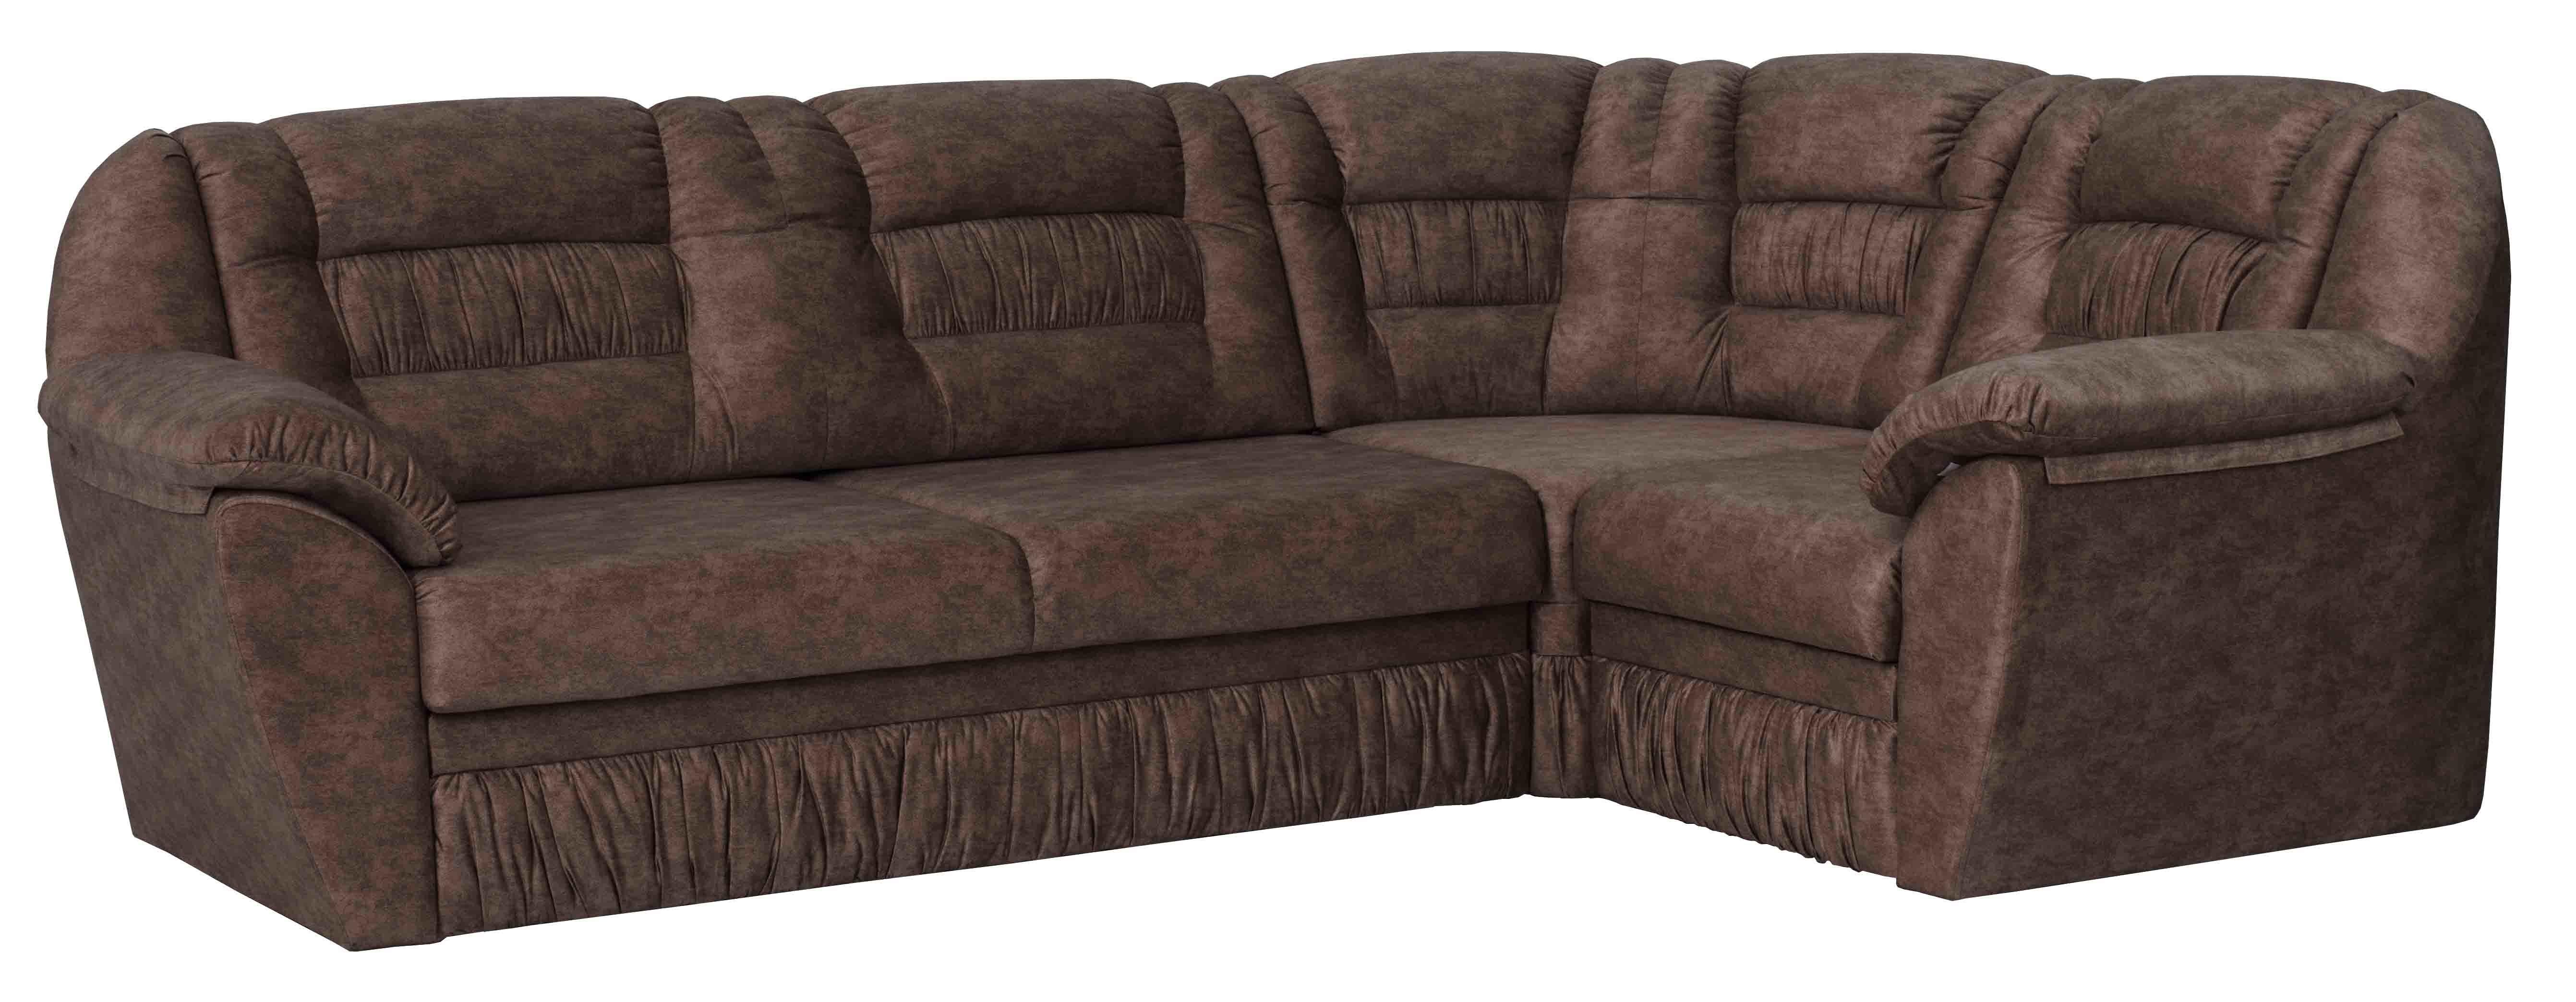 Угловой диван Марсель 3 ДУ фото